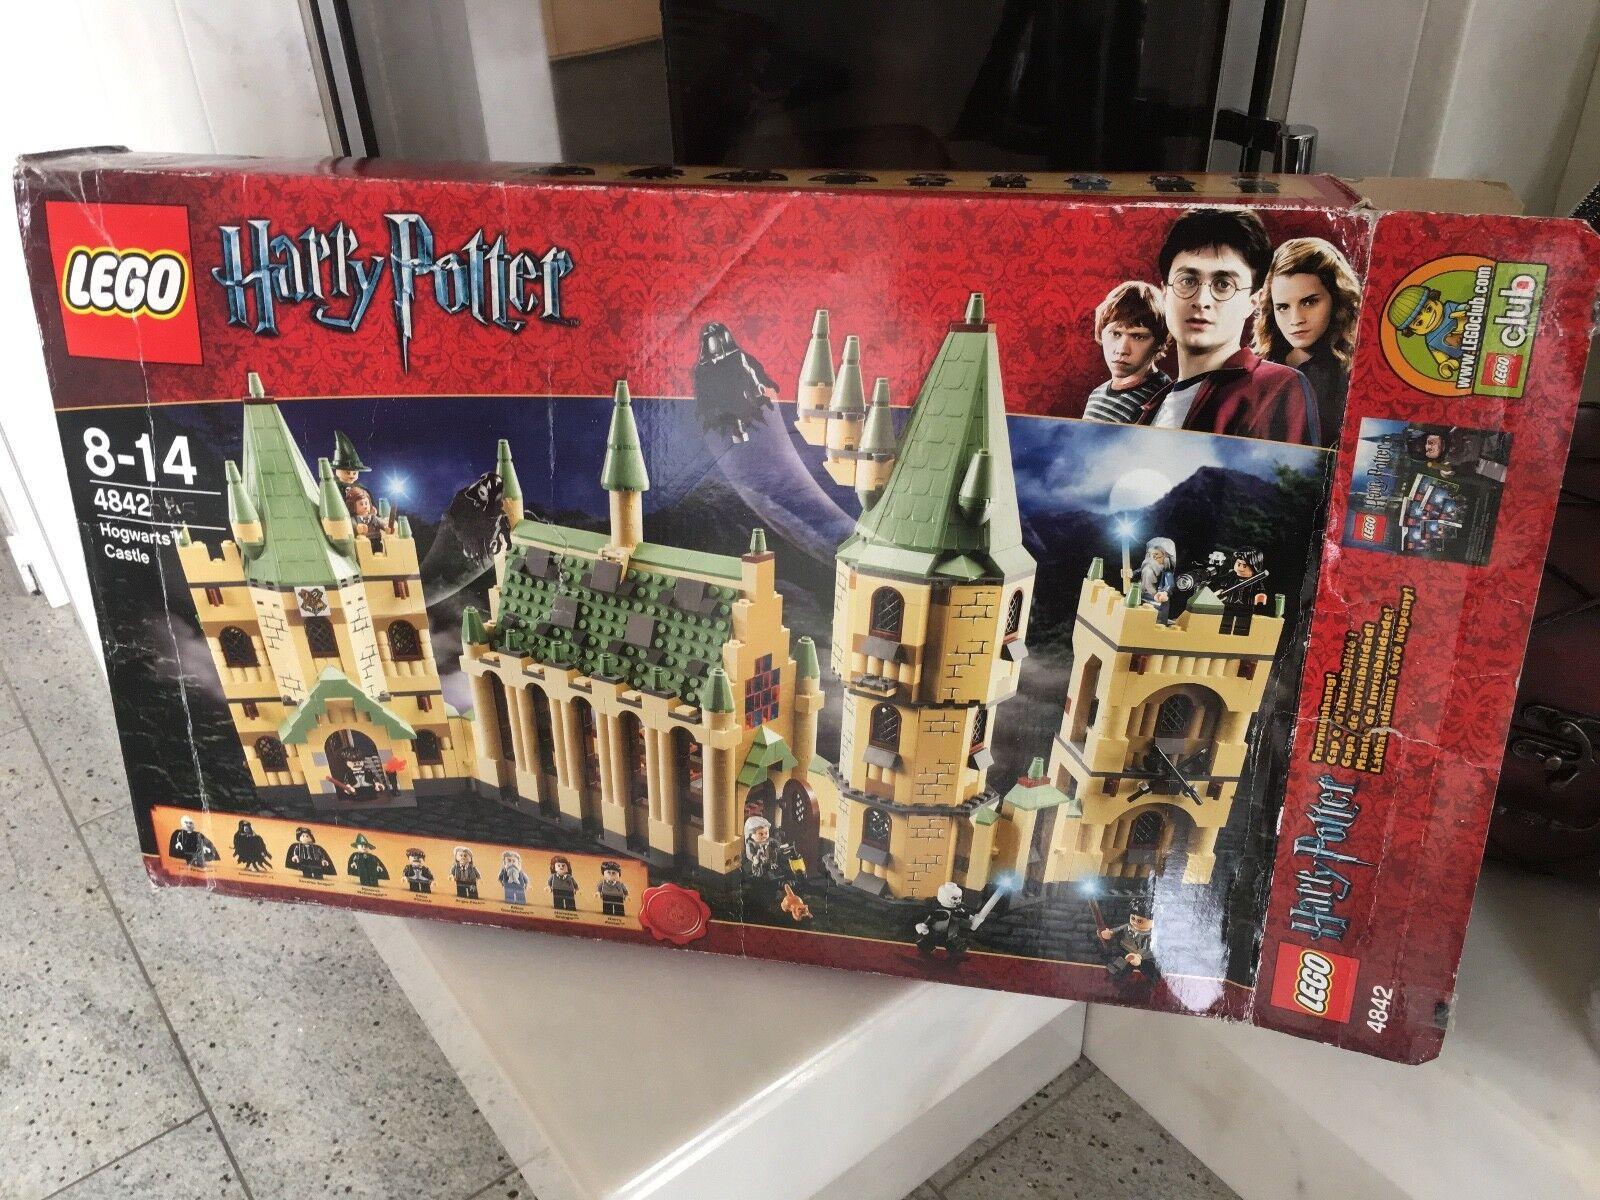 Lego Harry Potter Potter Potter 4842 castillo Hogwarts OVP 1234 piezas  ventas en linea